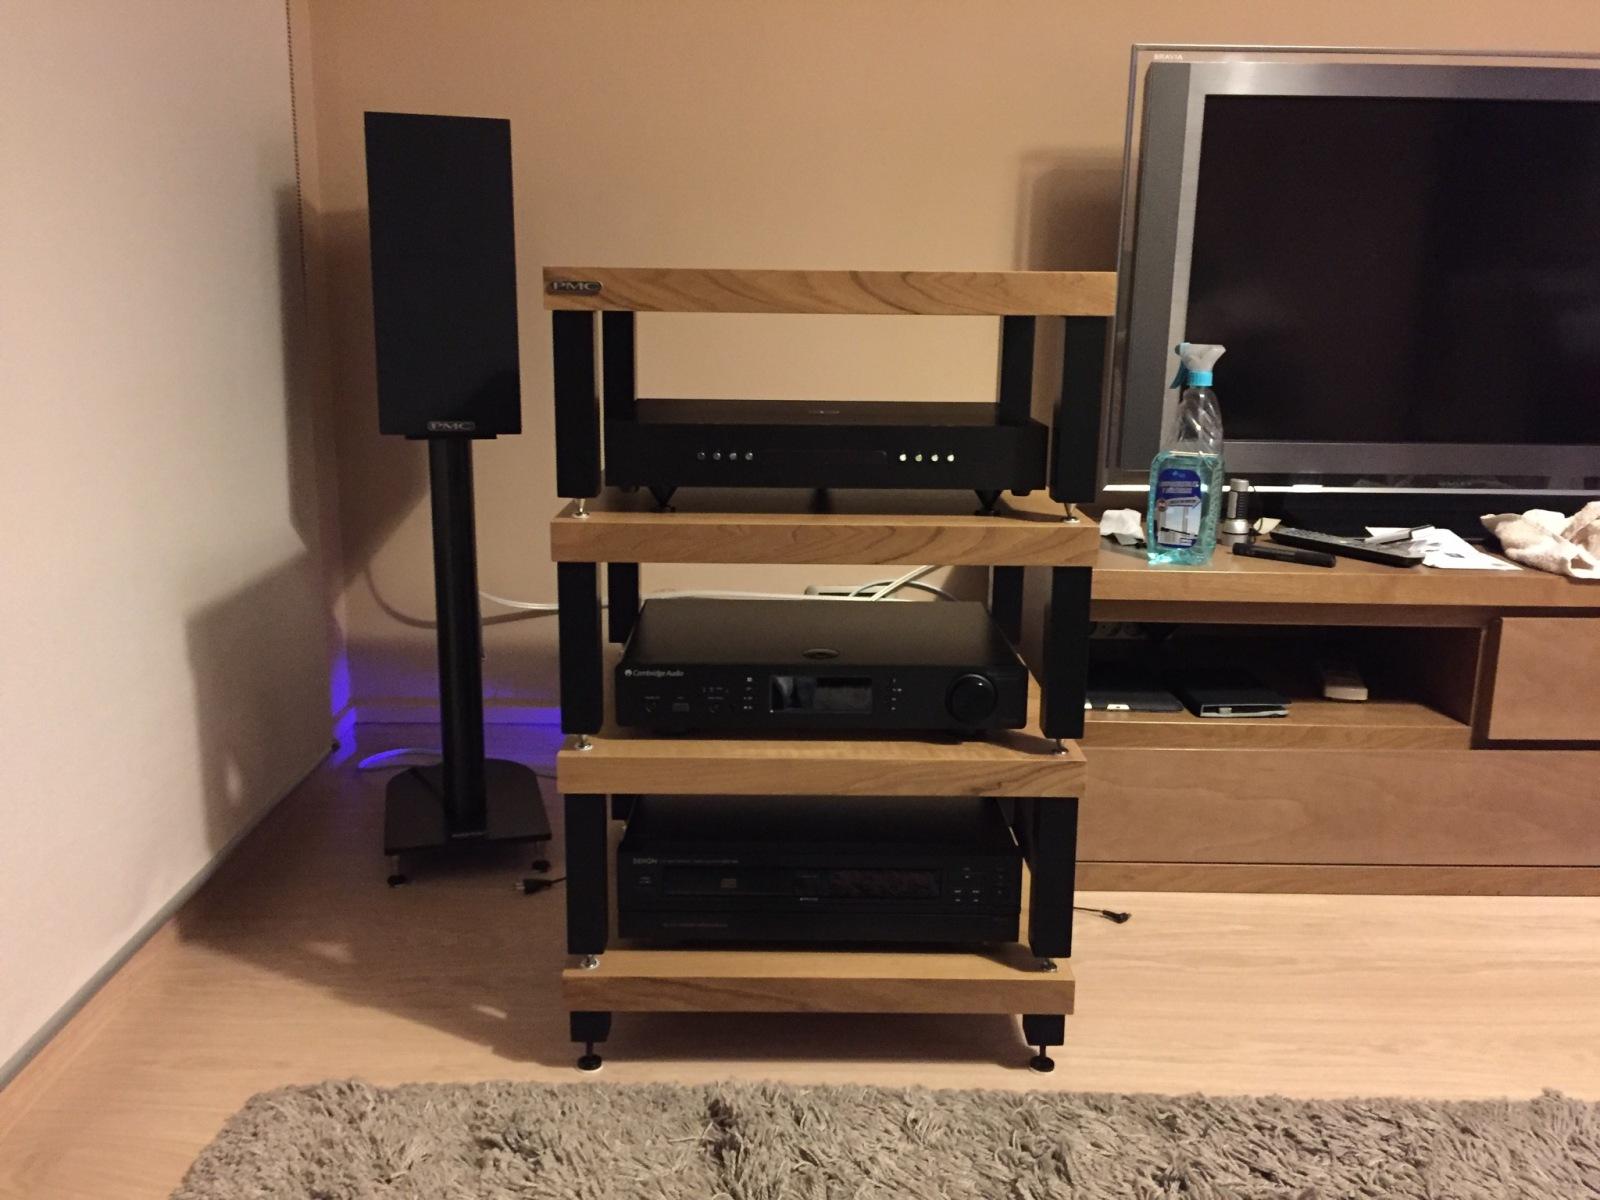 Nuevo mueble HIFI HUM 33lm4iu